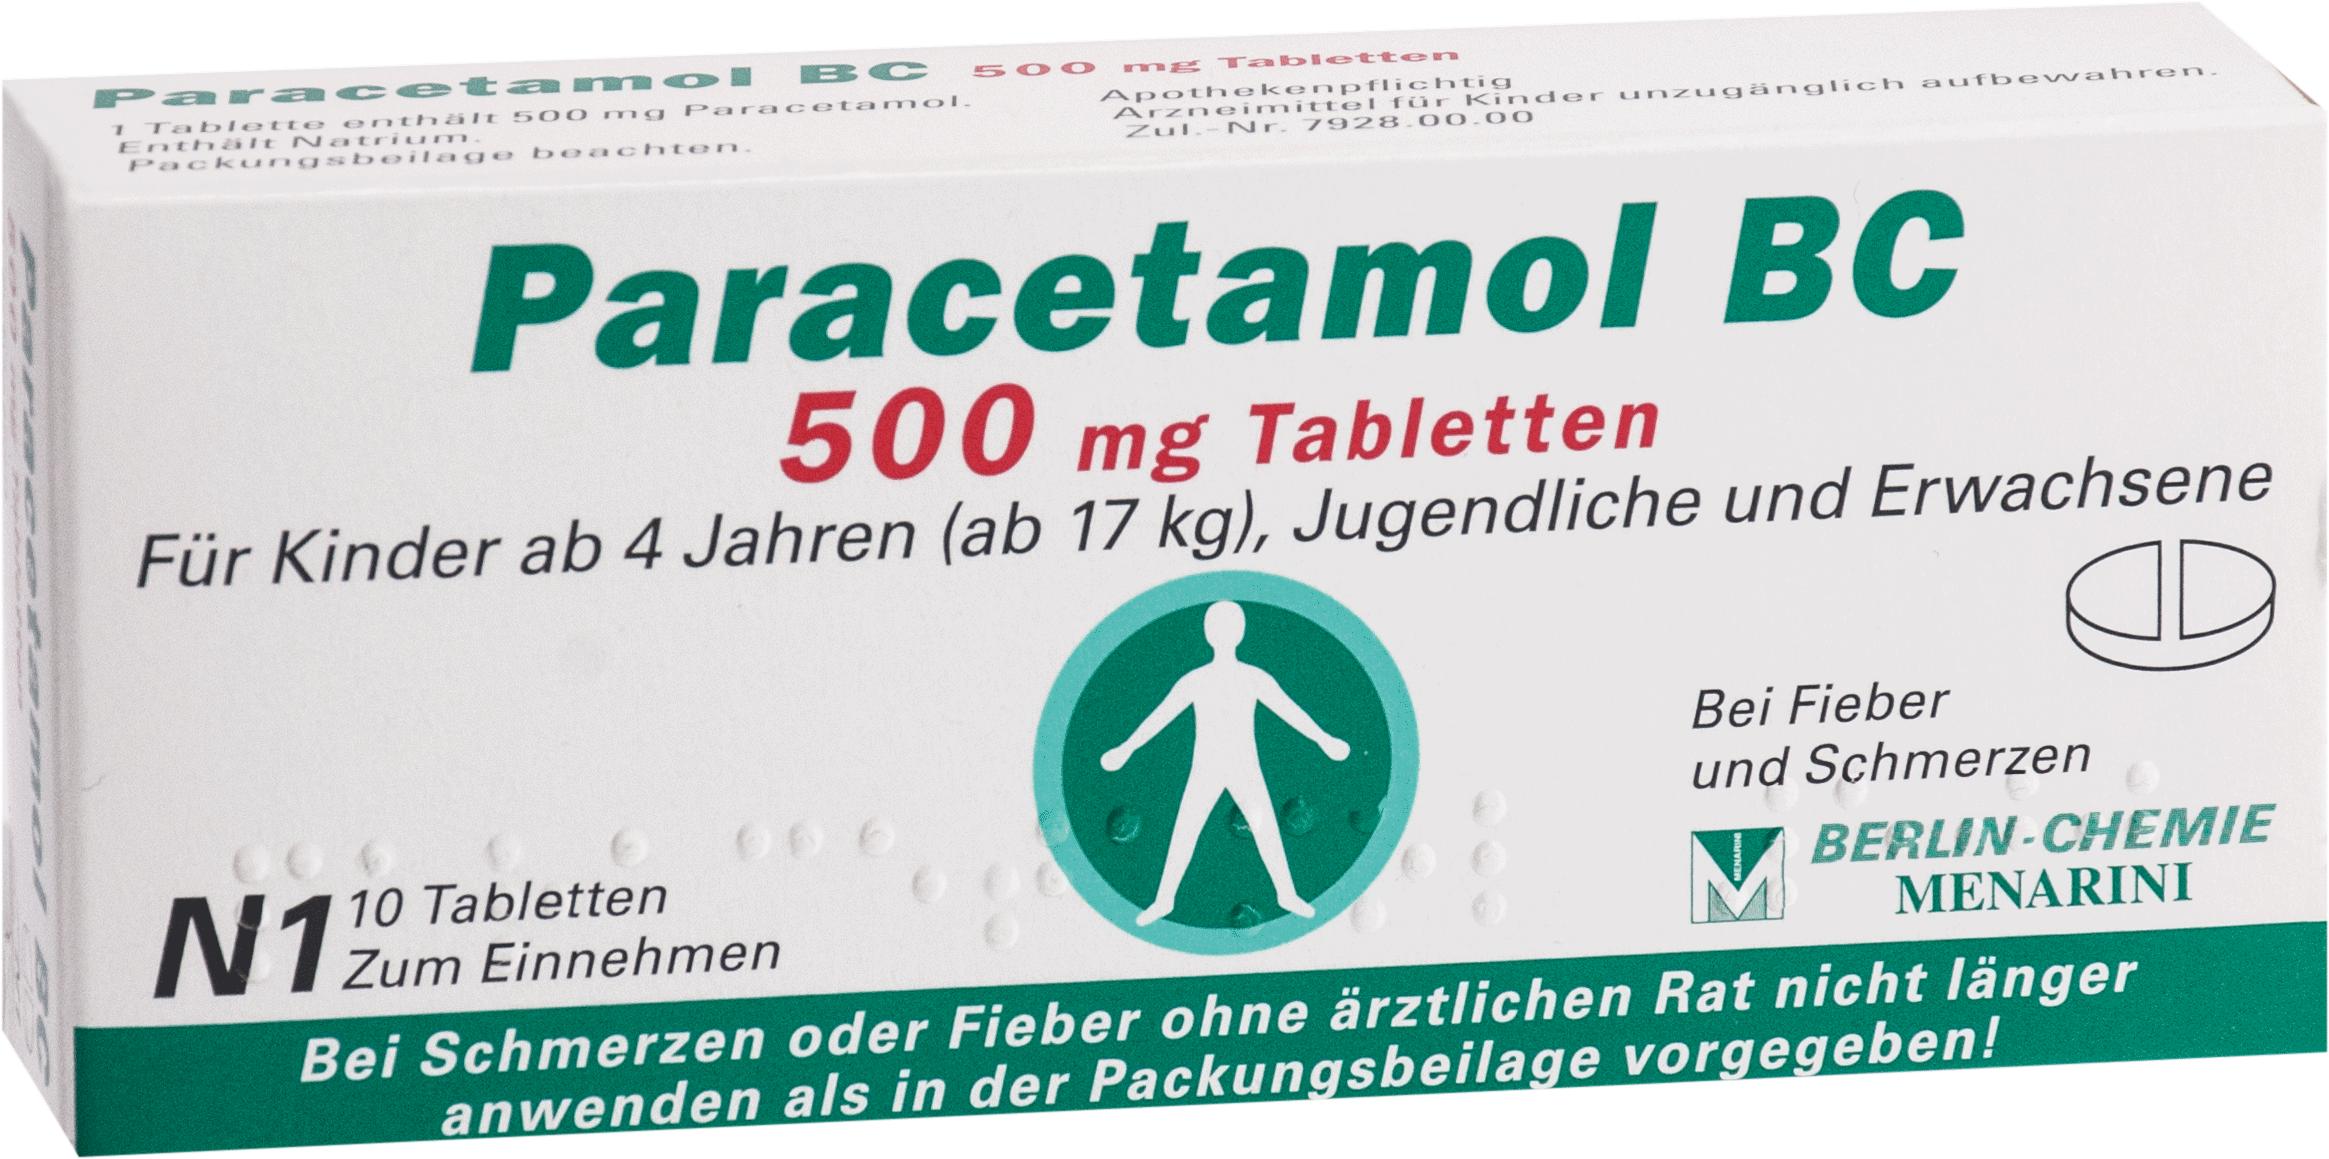 Paracetamol BC 500mg Tabletten